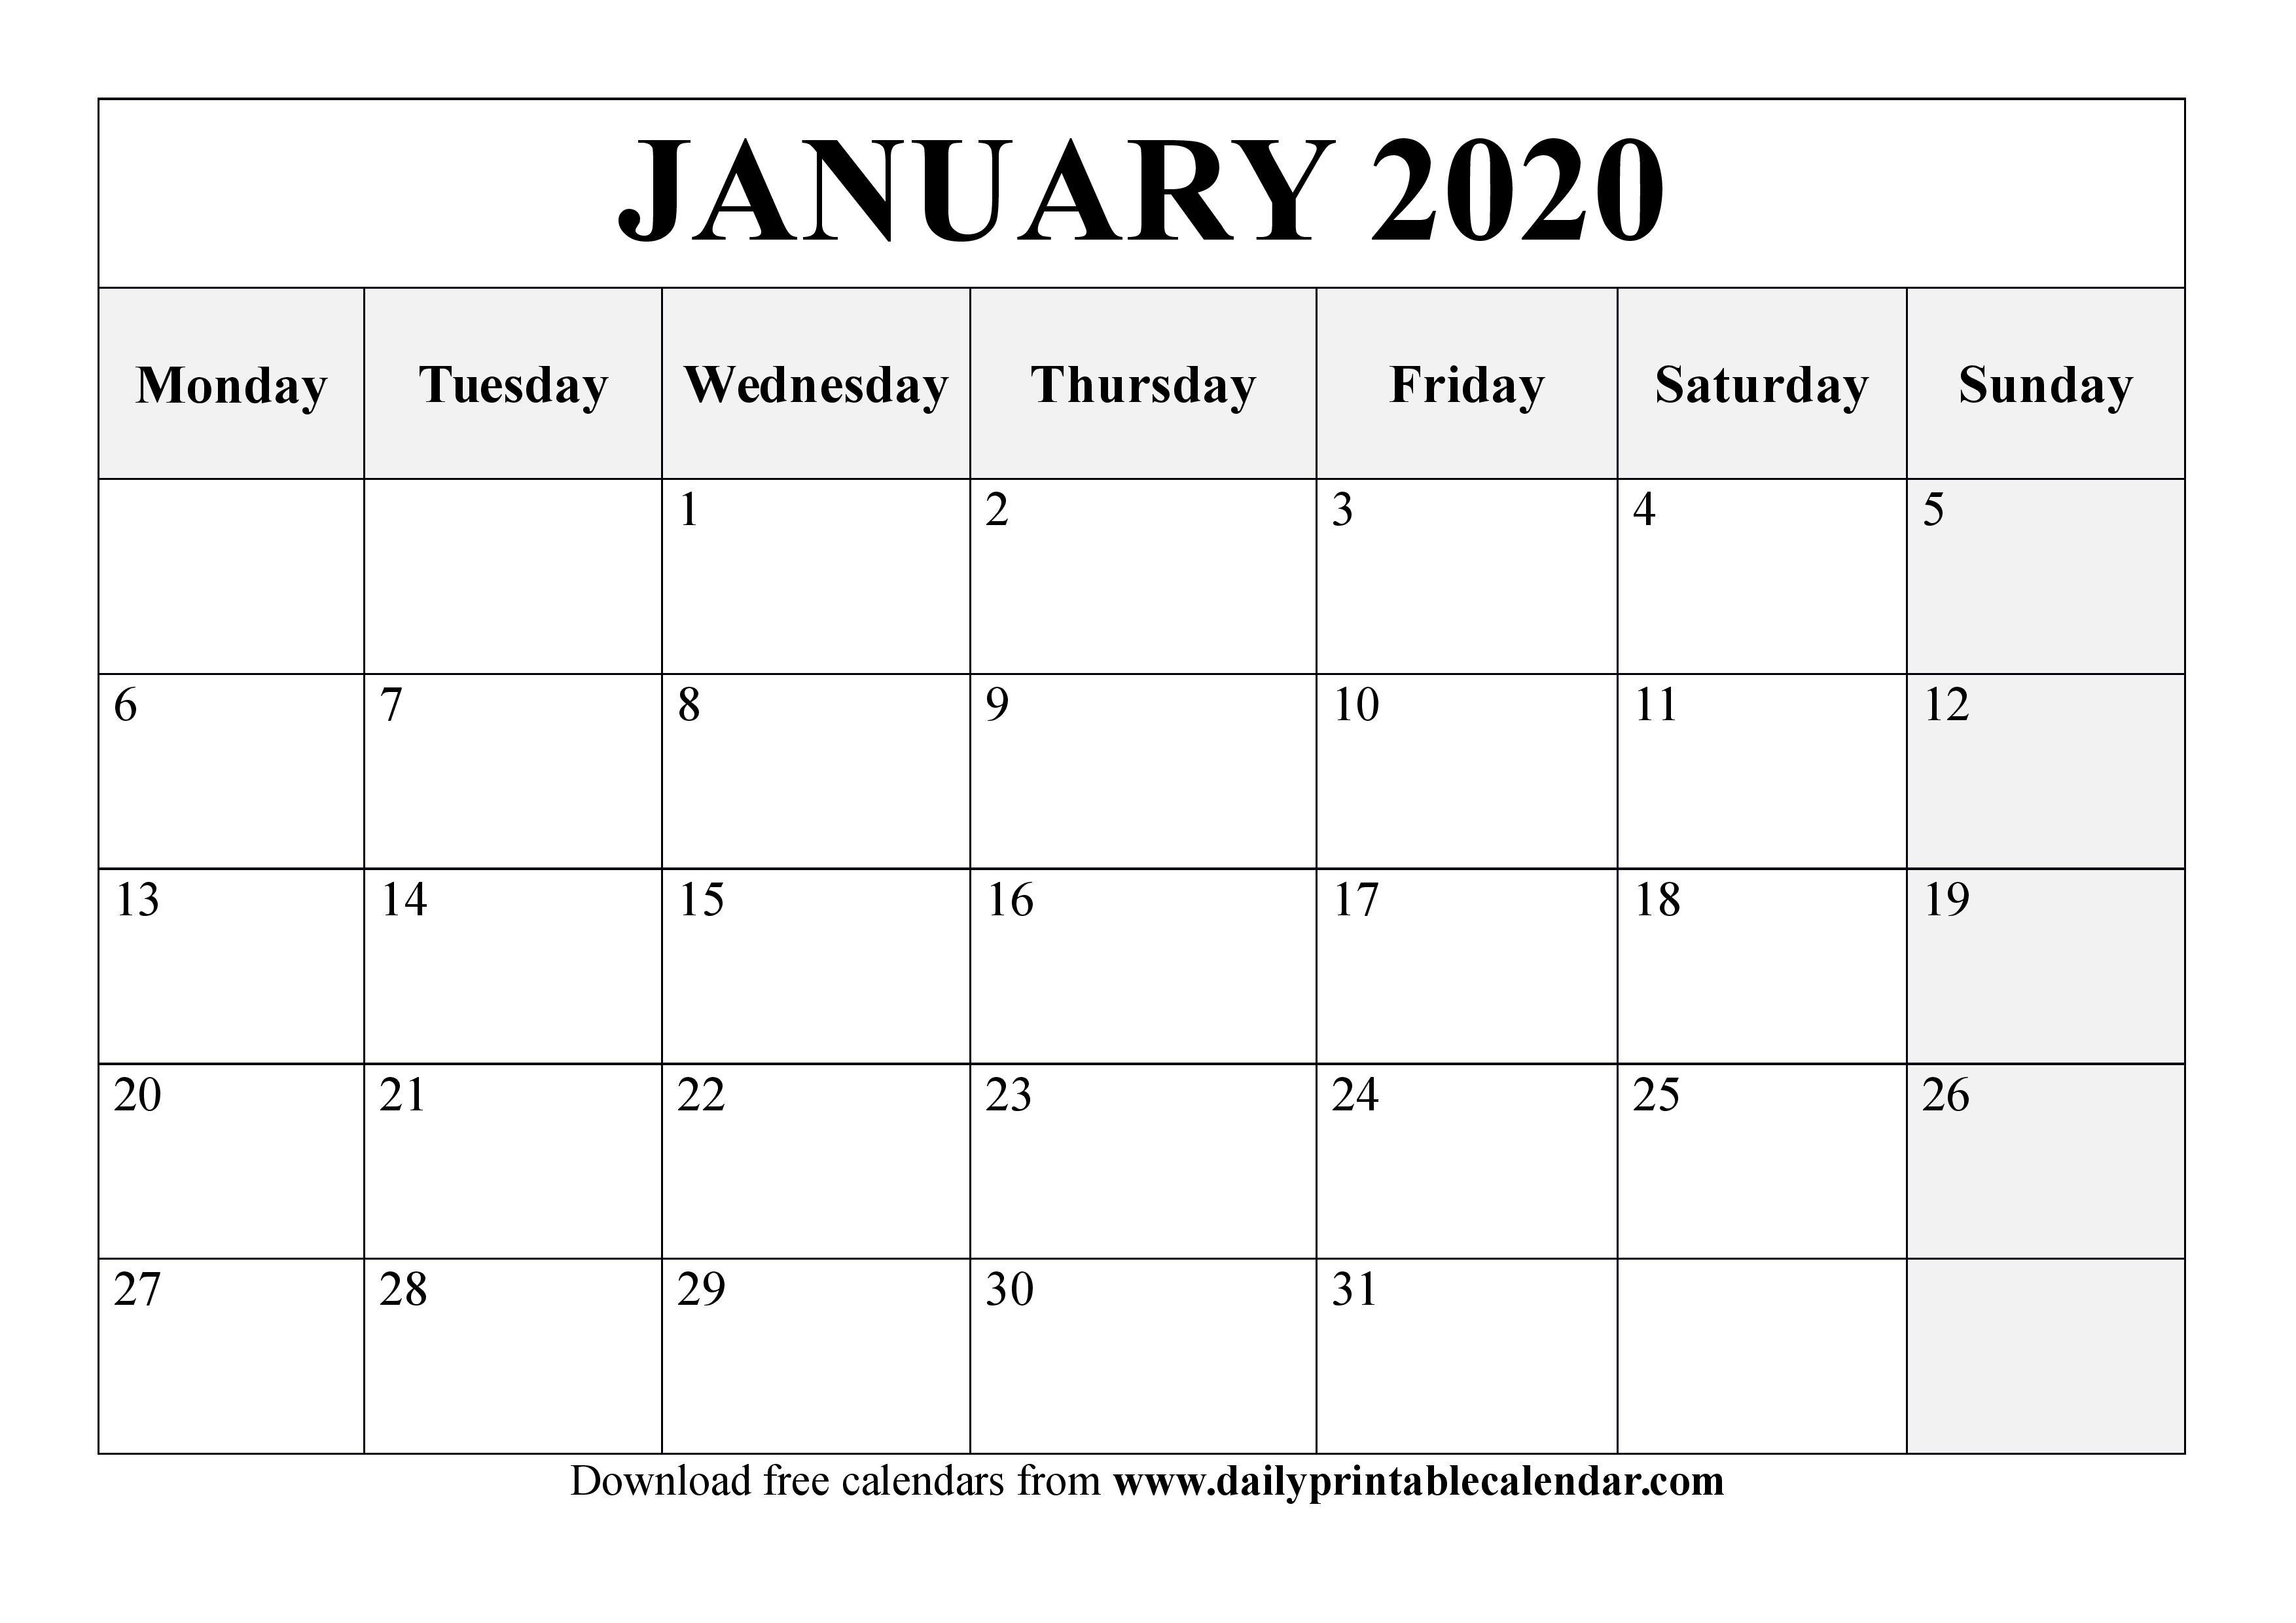 January 2020 Calendar Printable  Blank Templates  2020 throughout January 2020 Calendar Starting Monday